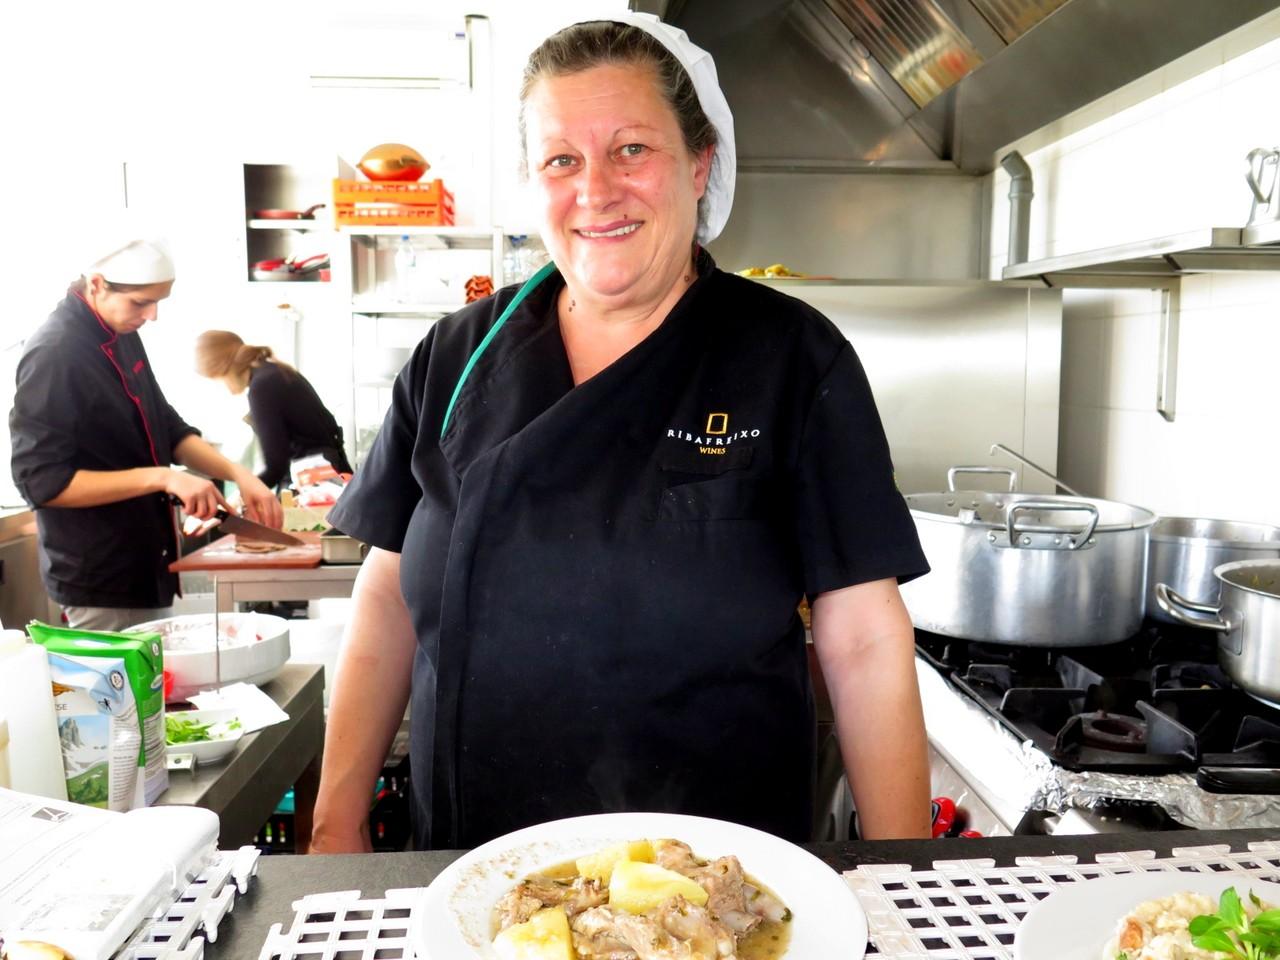 Chefe Paula Caetano